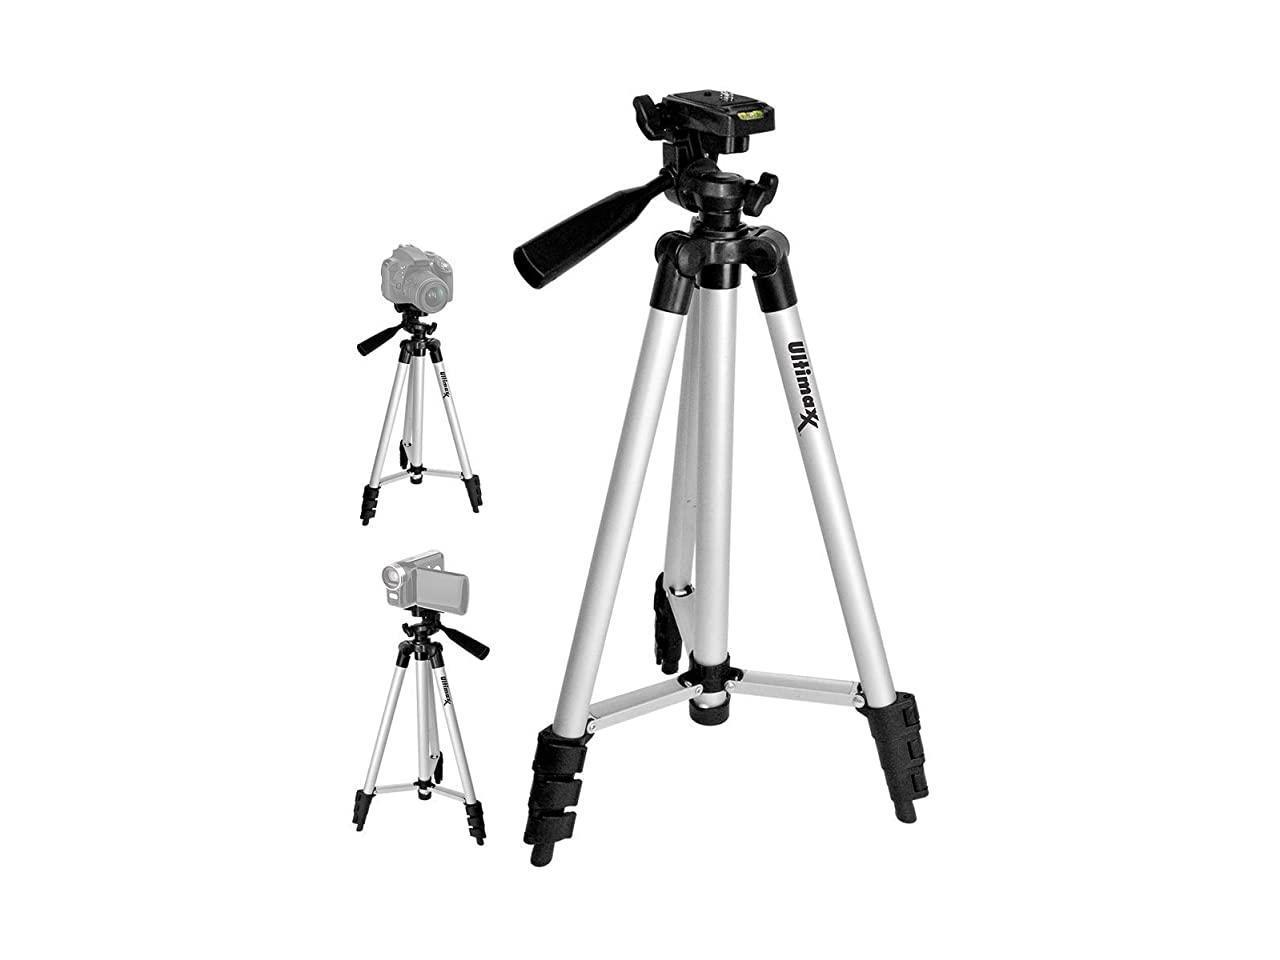 Pro 500mm 1000mm f8 Manual MultiCoated Preset Telephoto